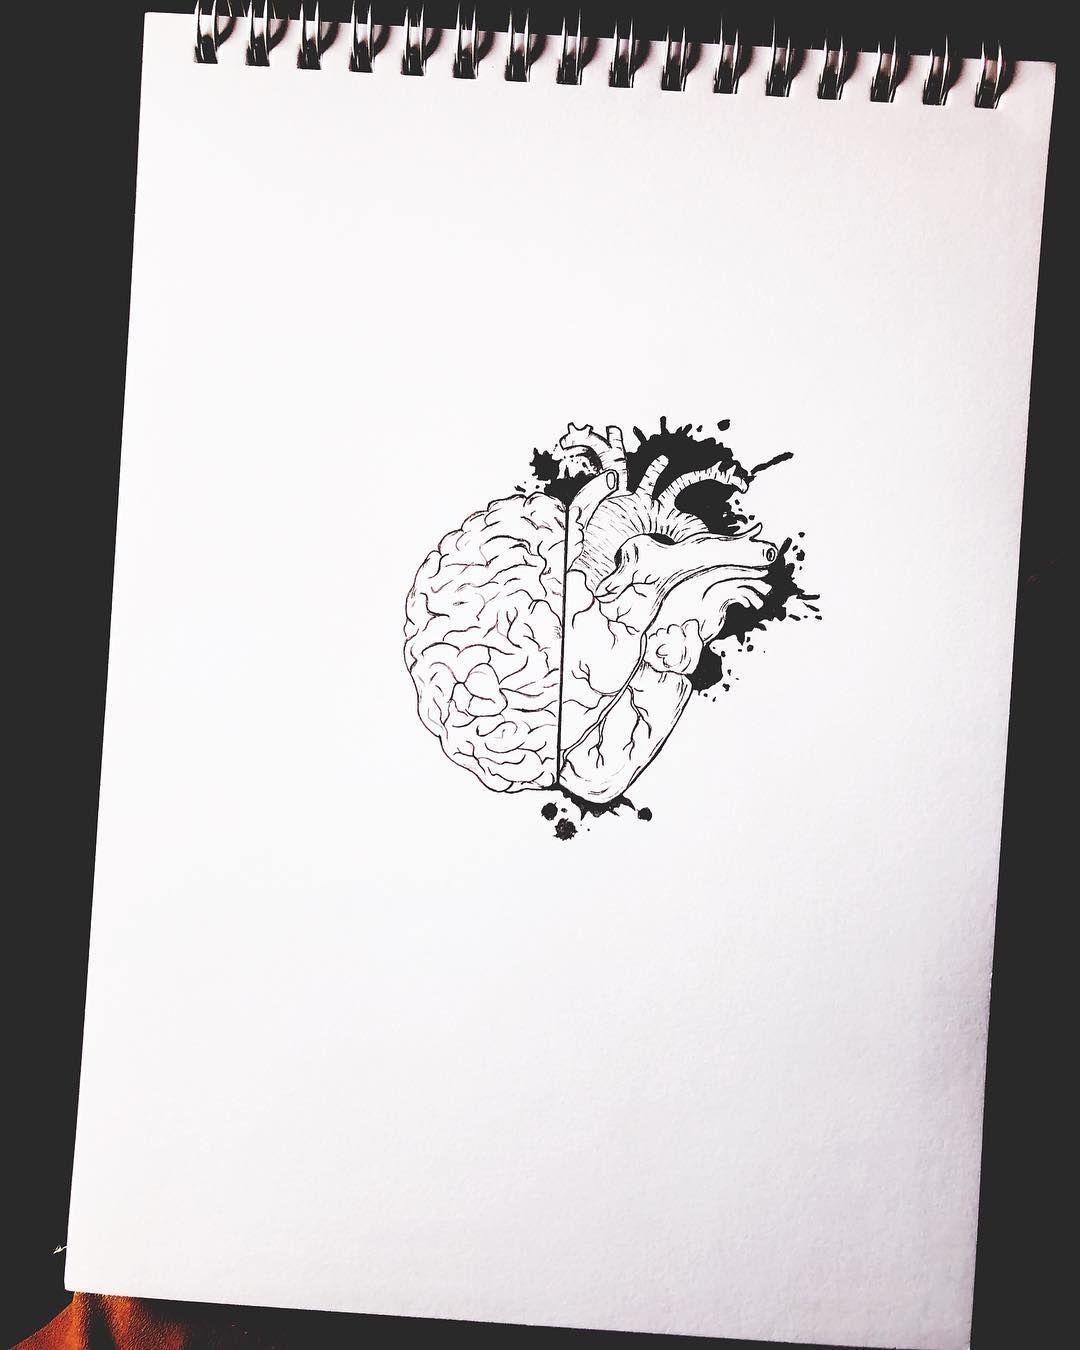 مابين قلب يريد وعقل يرفض Between The Heart Wants And Mind Refuses رسمي طور فنك رسمتي رسمتي رسمتي المتواضعه كلنا Framed Wallpaper Tattoo Drawings Art